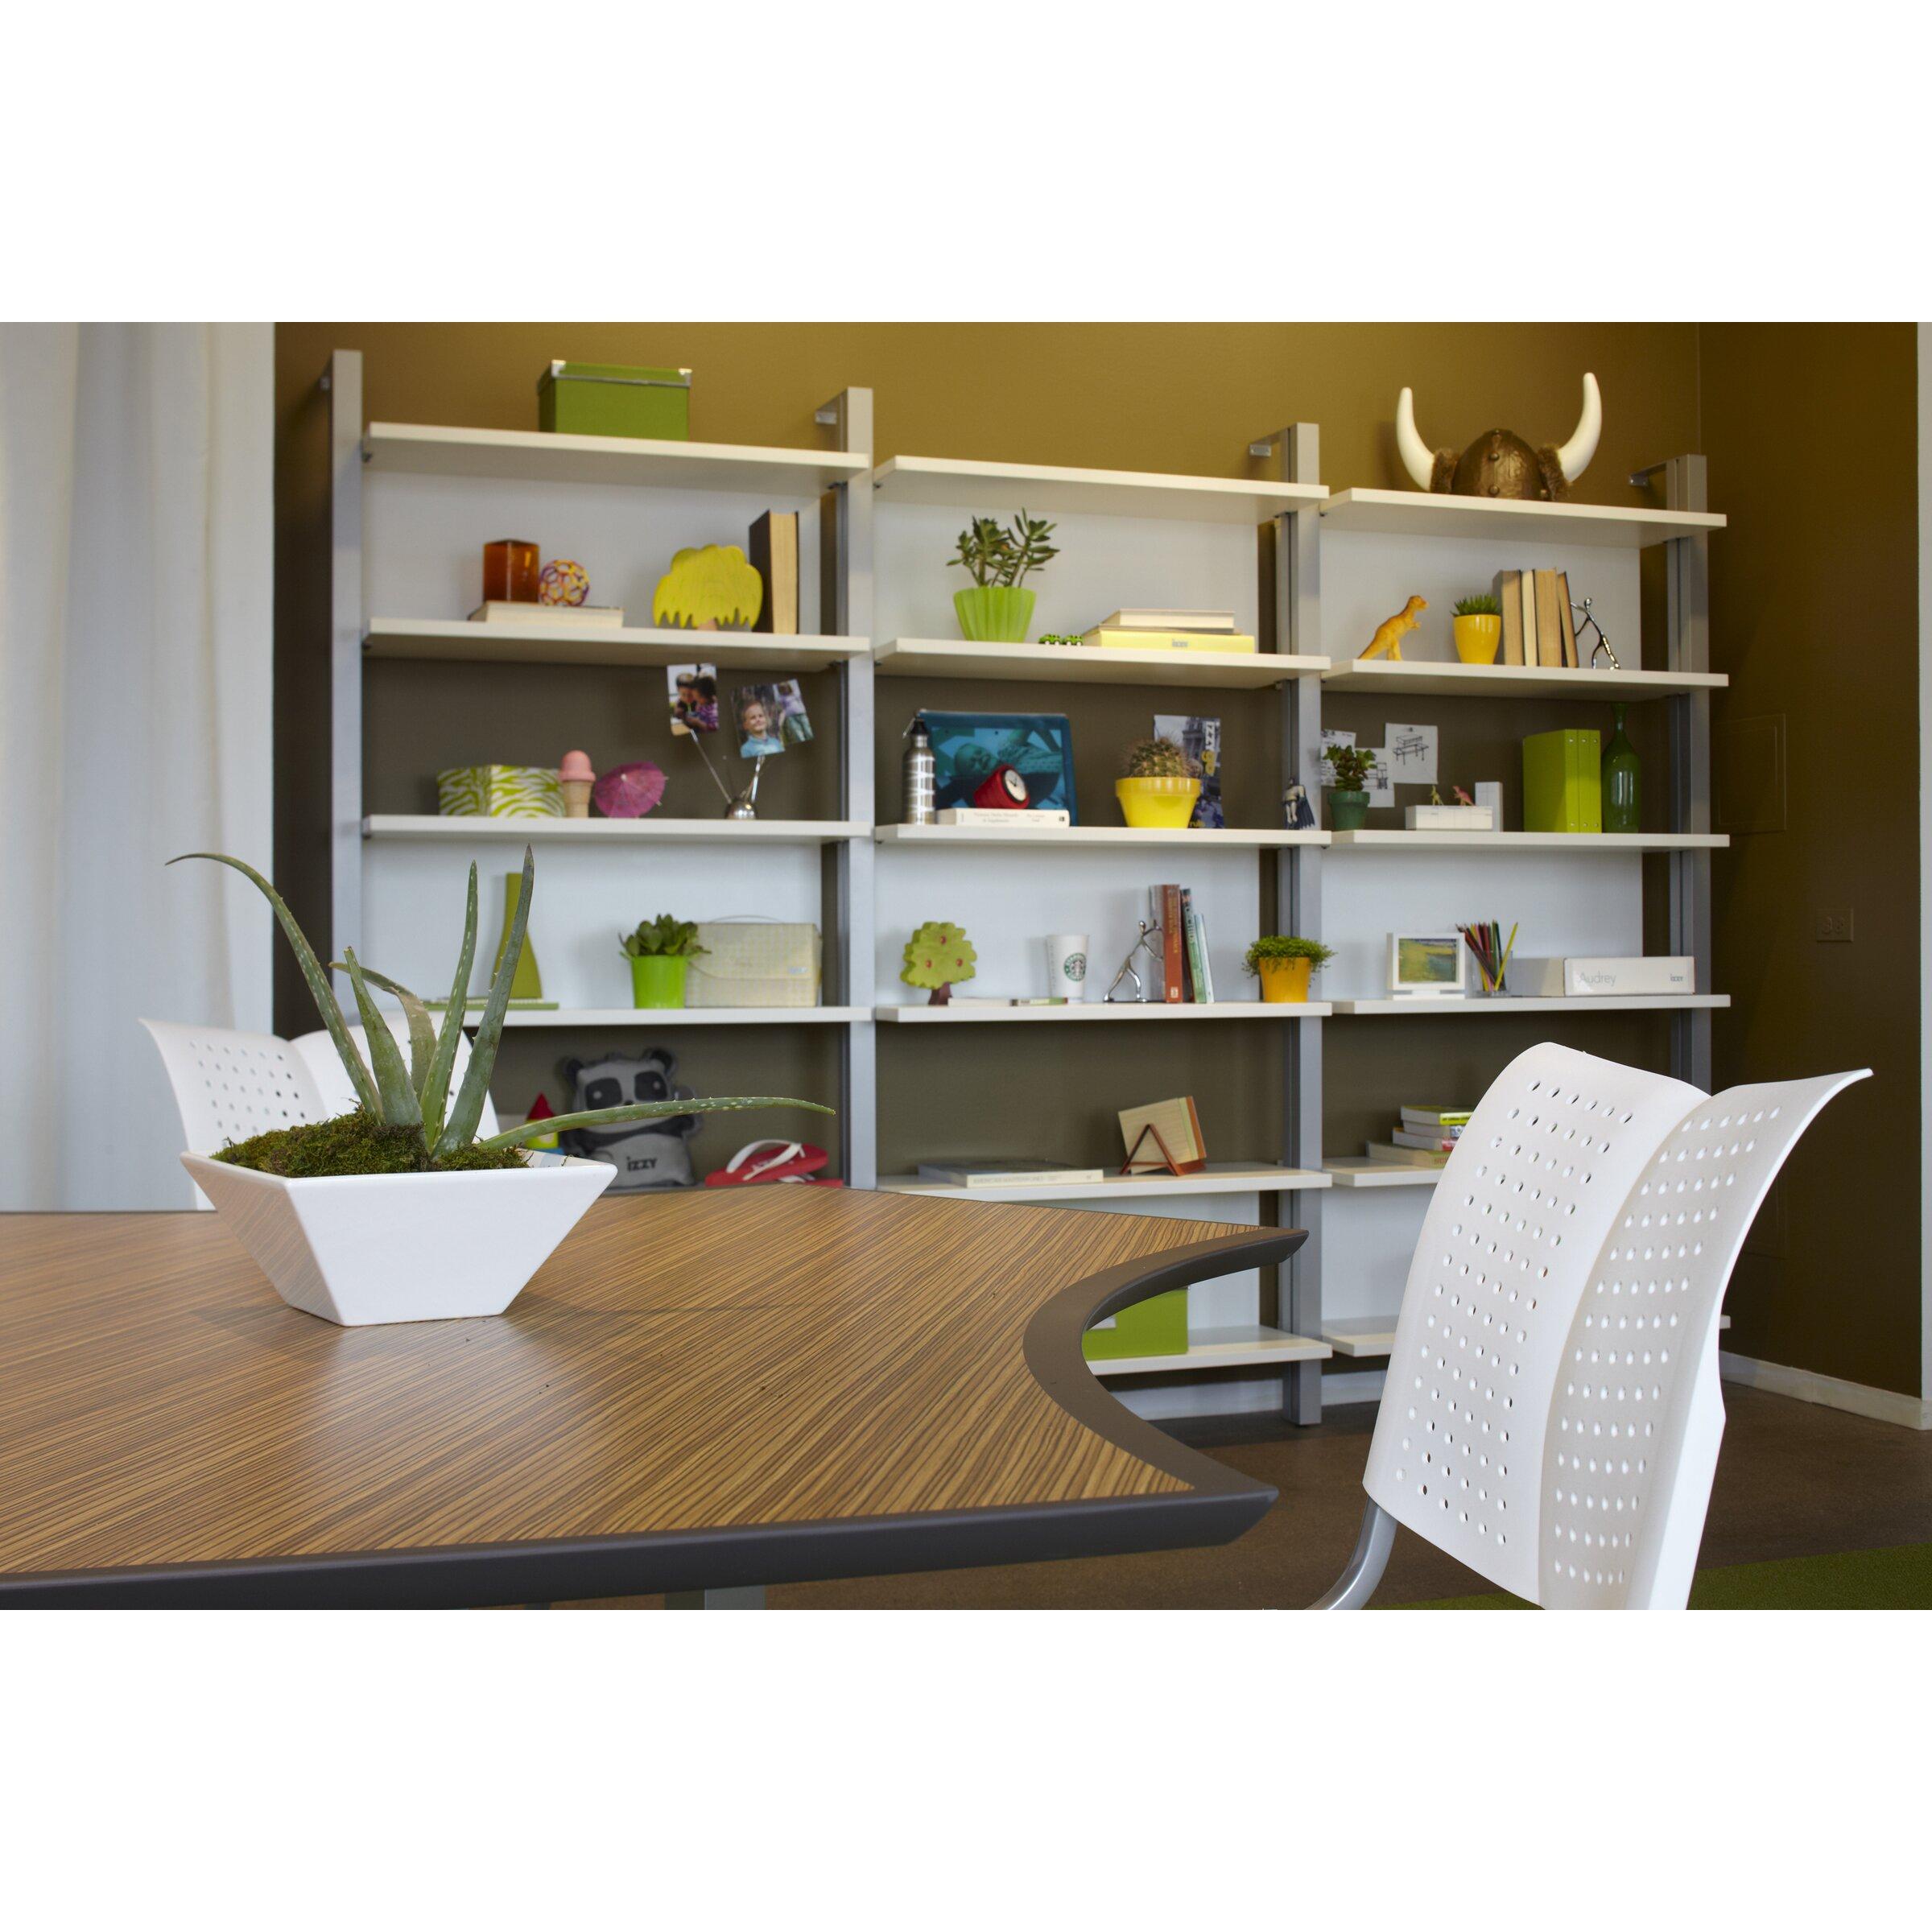 izzy design dewey 81 oversized set bookcase wayfair. Black Bedroom Furniture Sets. Home Design Ideas